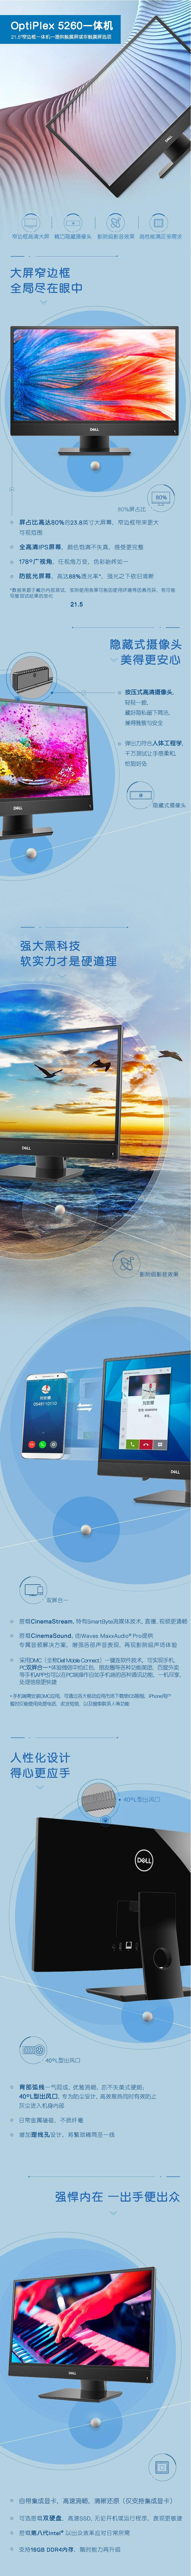 DELL_戴尔 5260一体机电脑高清触摸屏窄边框家用办公全套5000系列灵越21.5英寸AIOI5.jpg